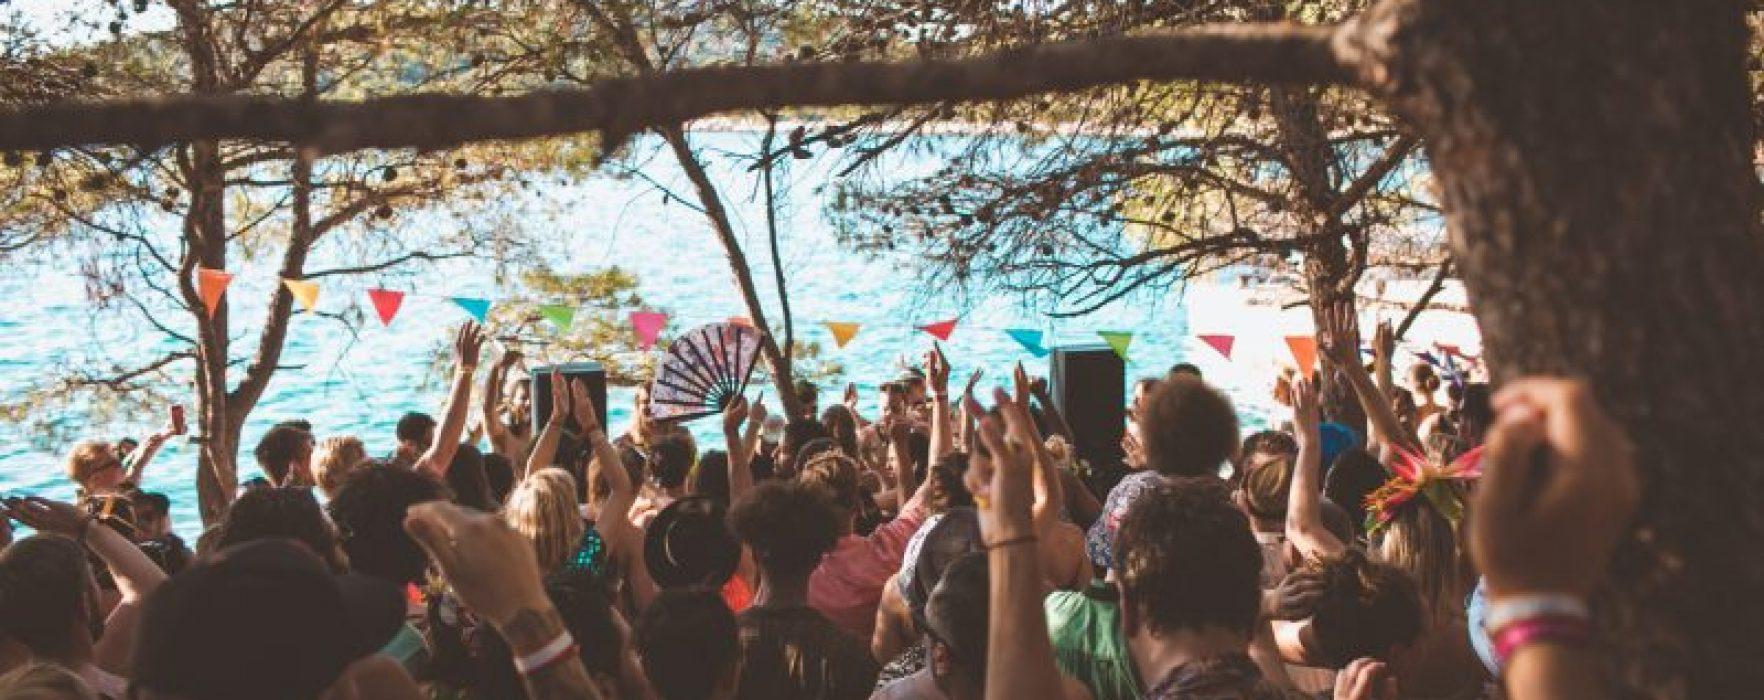 Love International festival release latest line up announcement